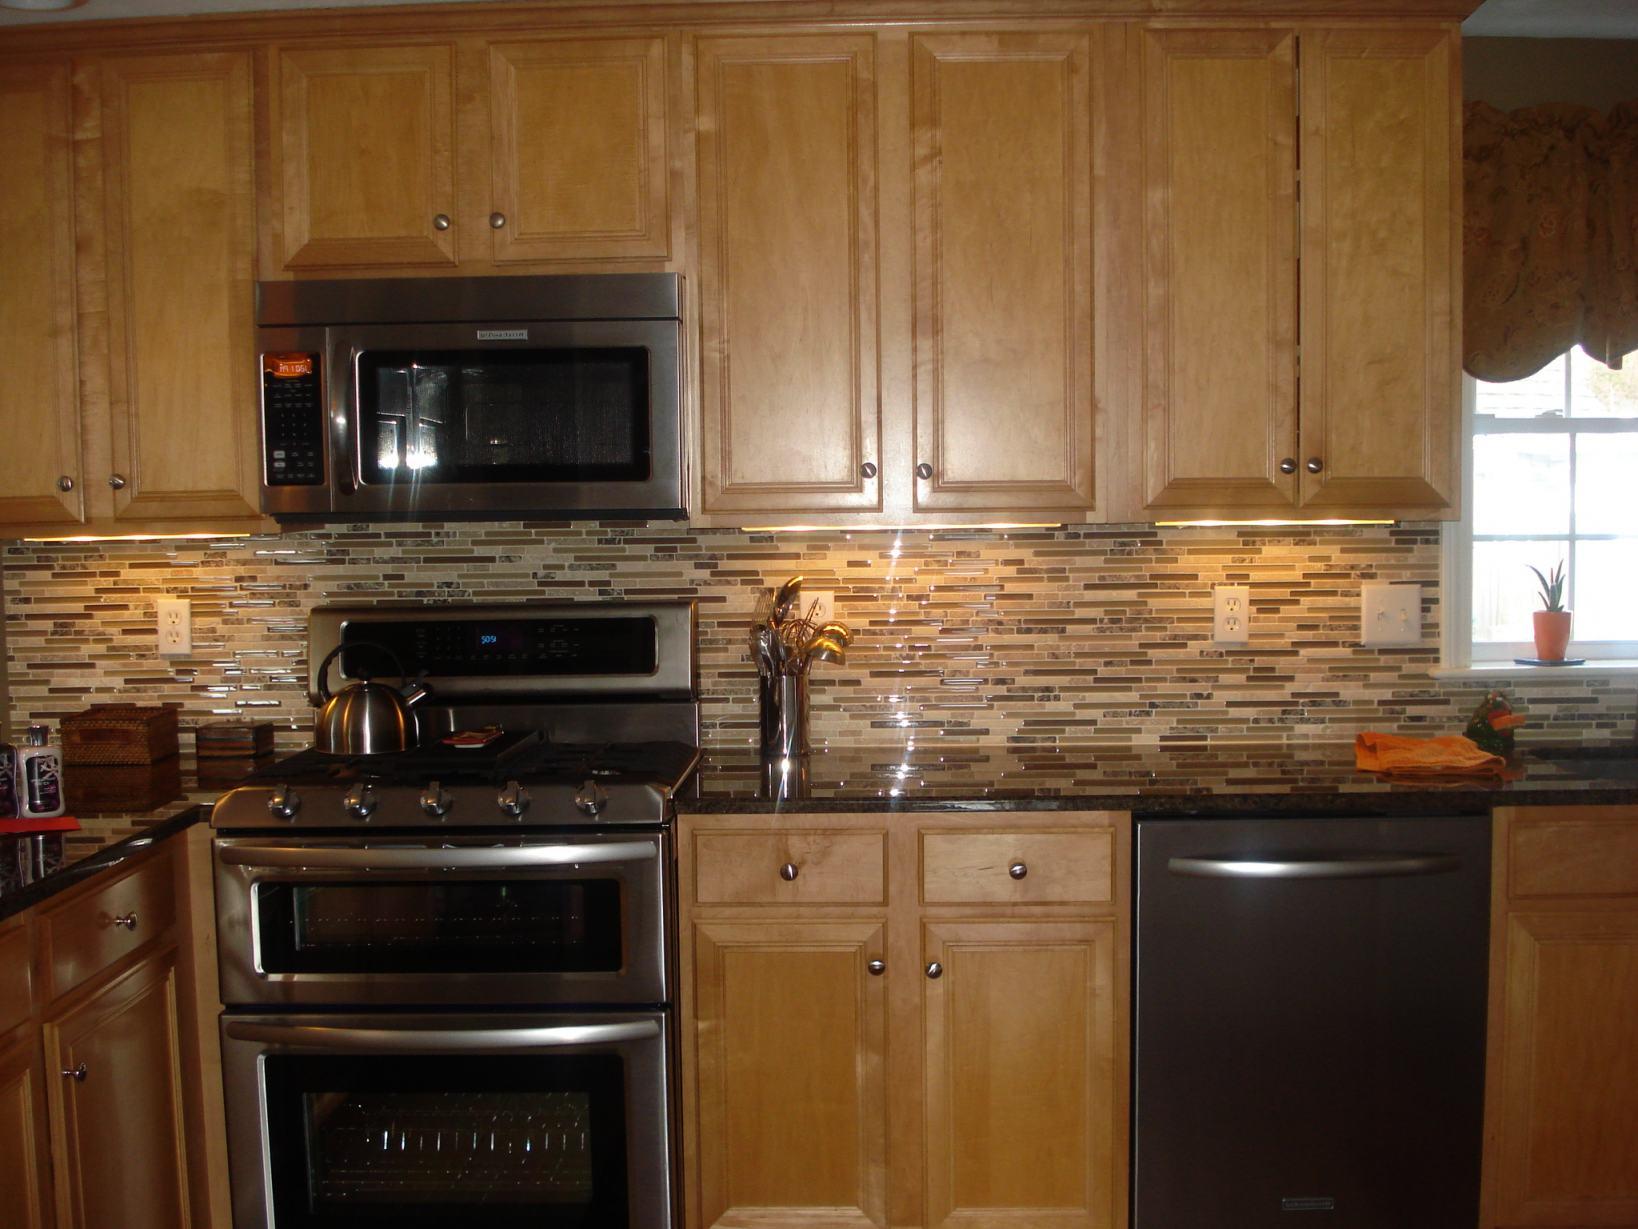 Black and bronze kitchen wallpaper photo - 4